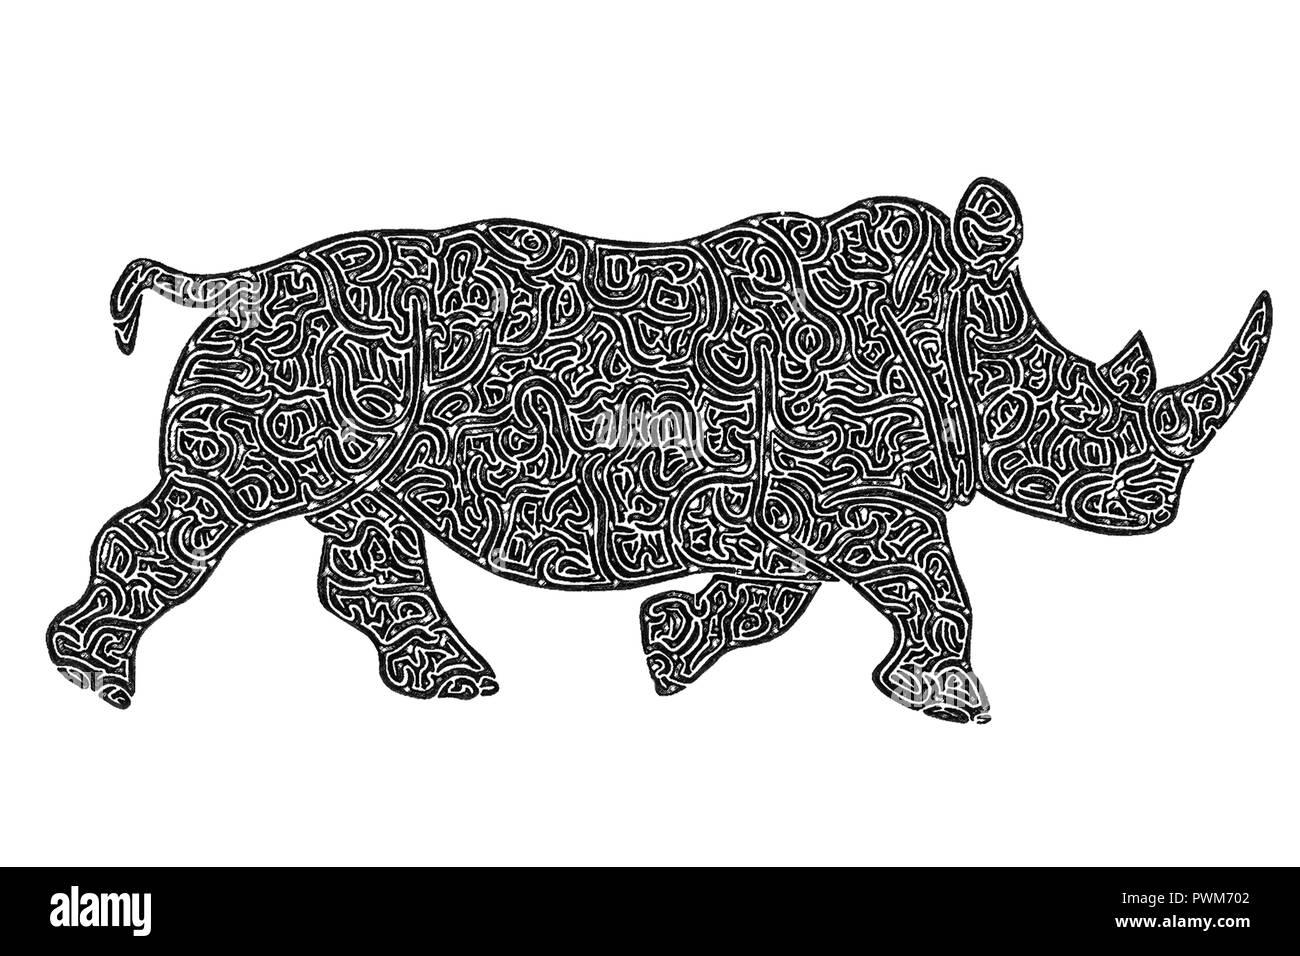 Illustration of Rhino running, black and white, drawing